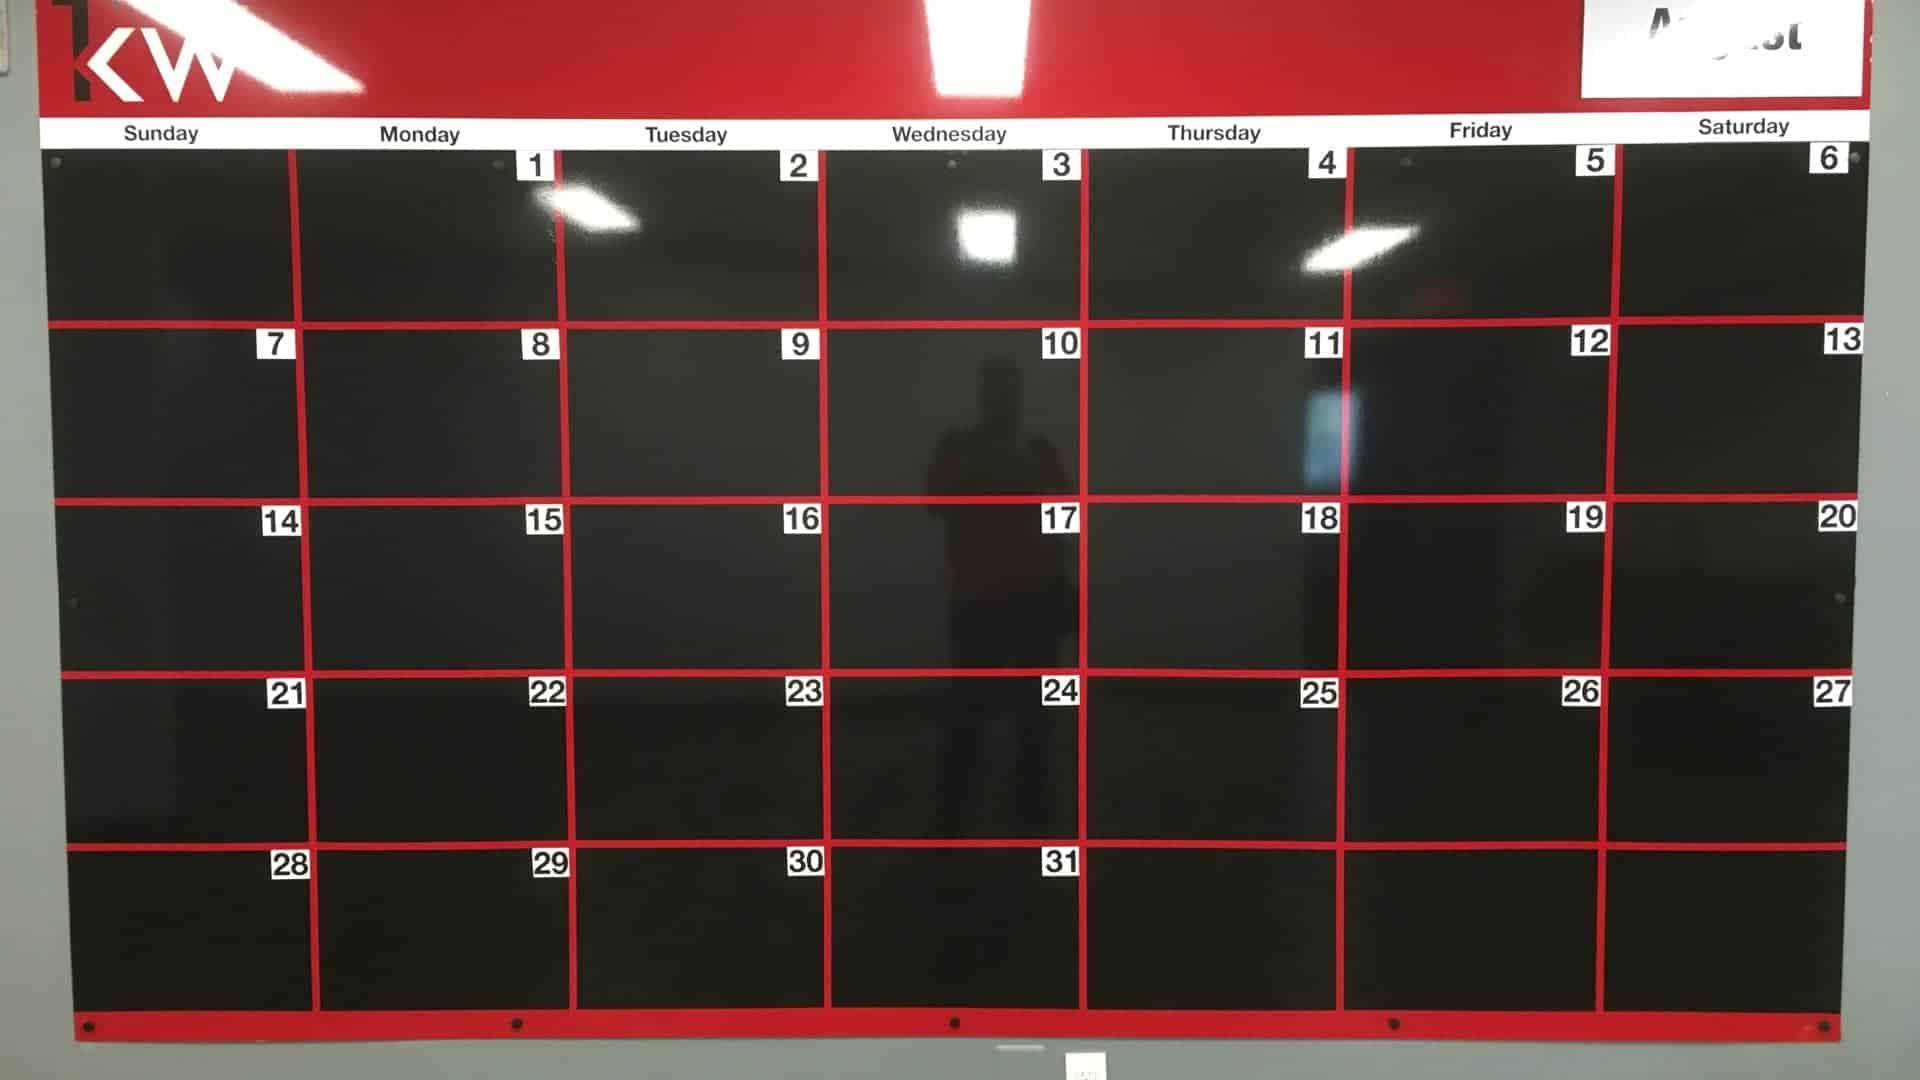 kw-calendar